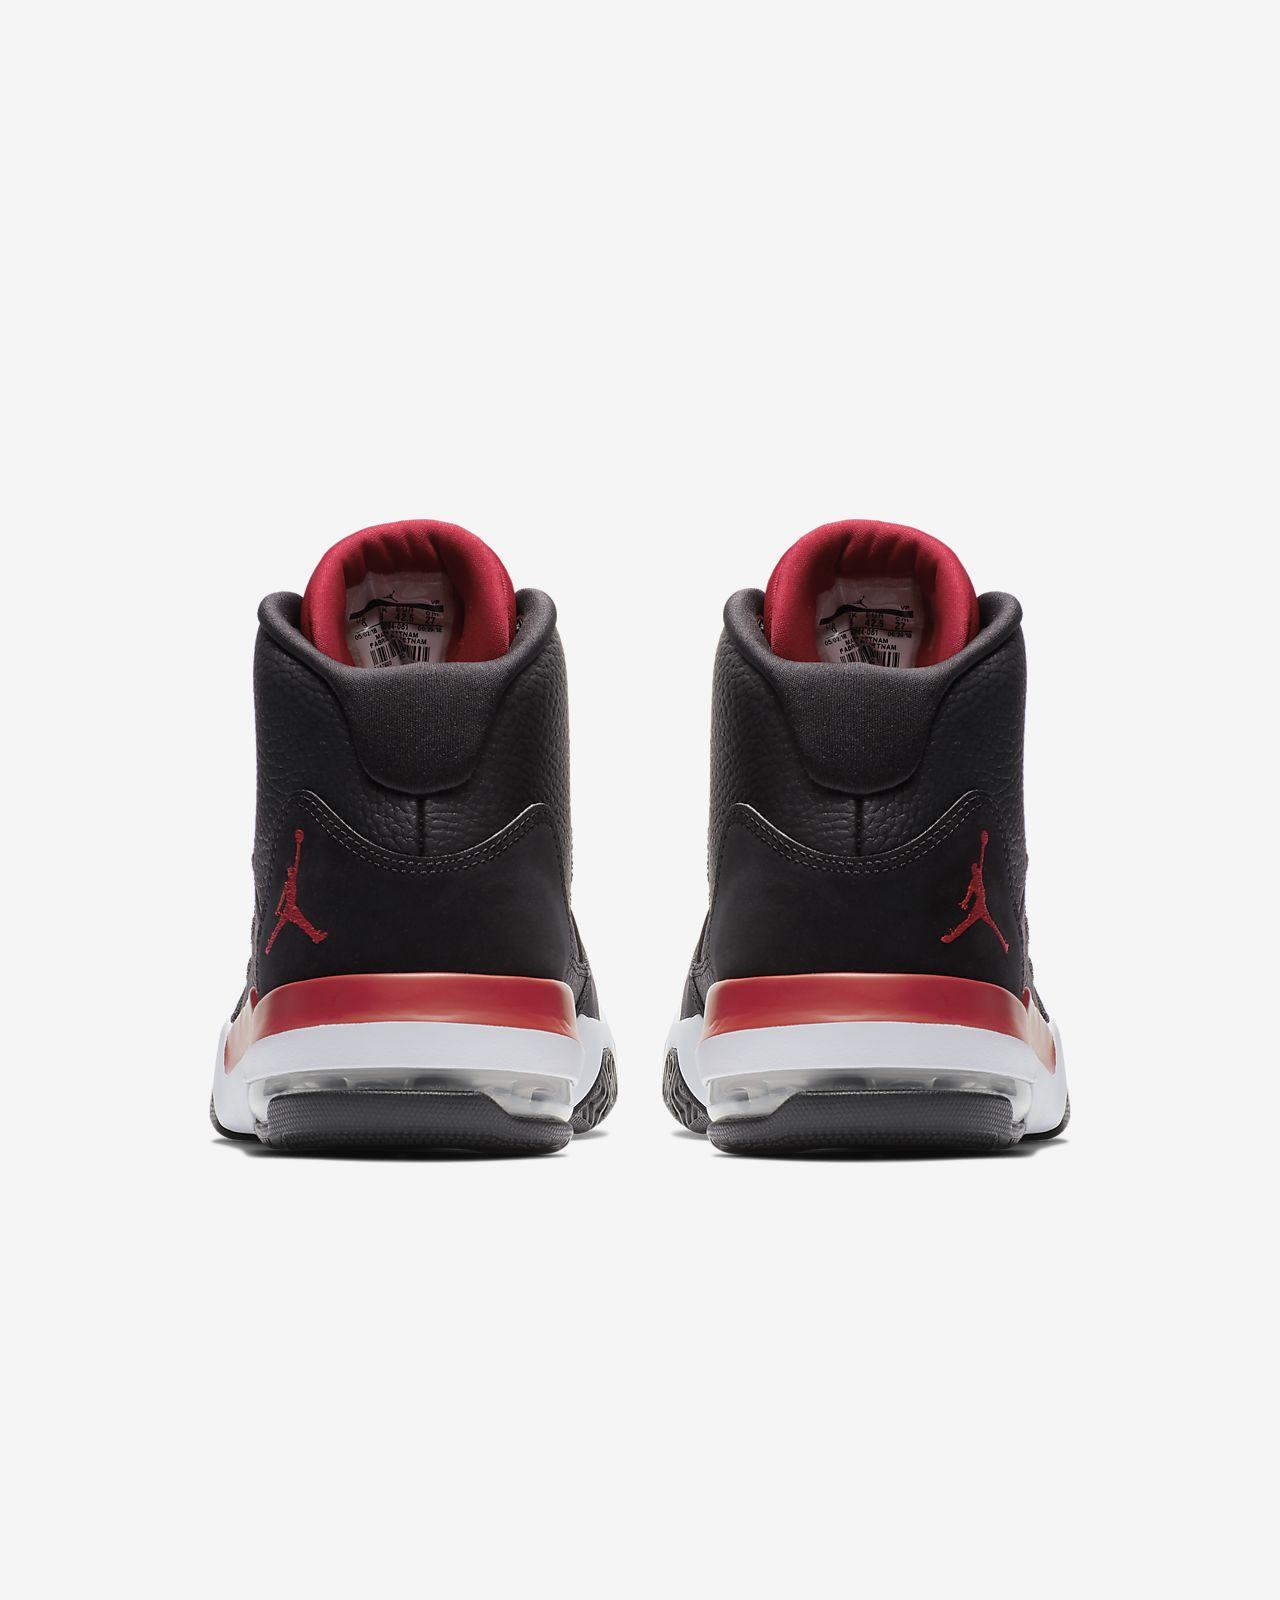 a971cac8a015 Jordan Max Aura Men s Basketball Shoe. Nike.com